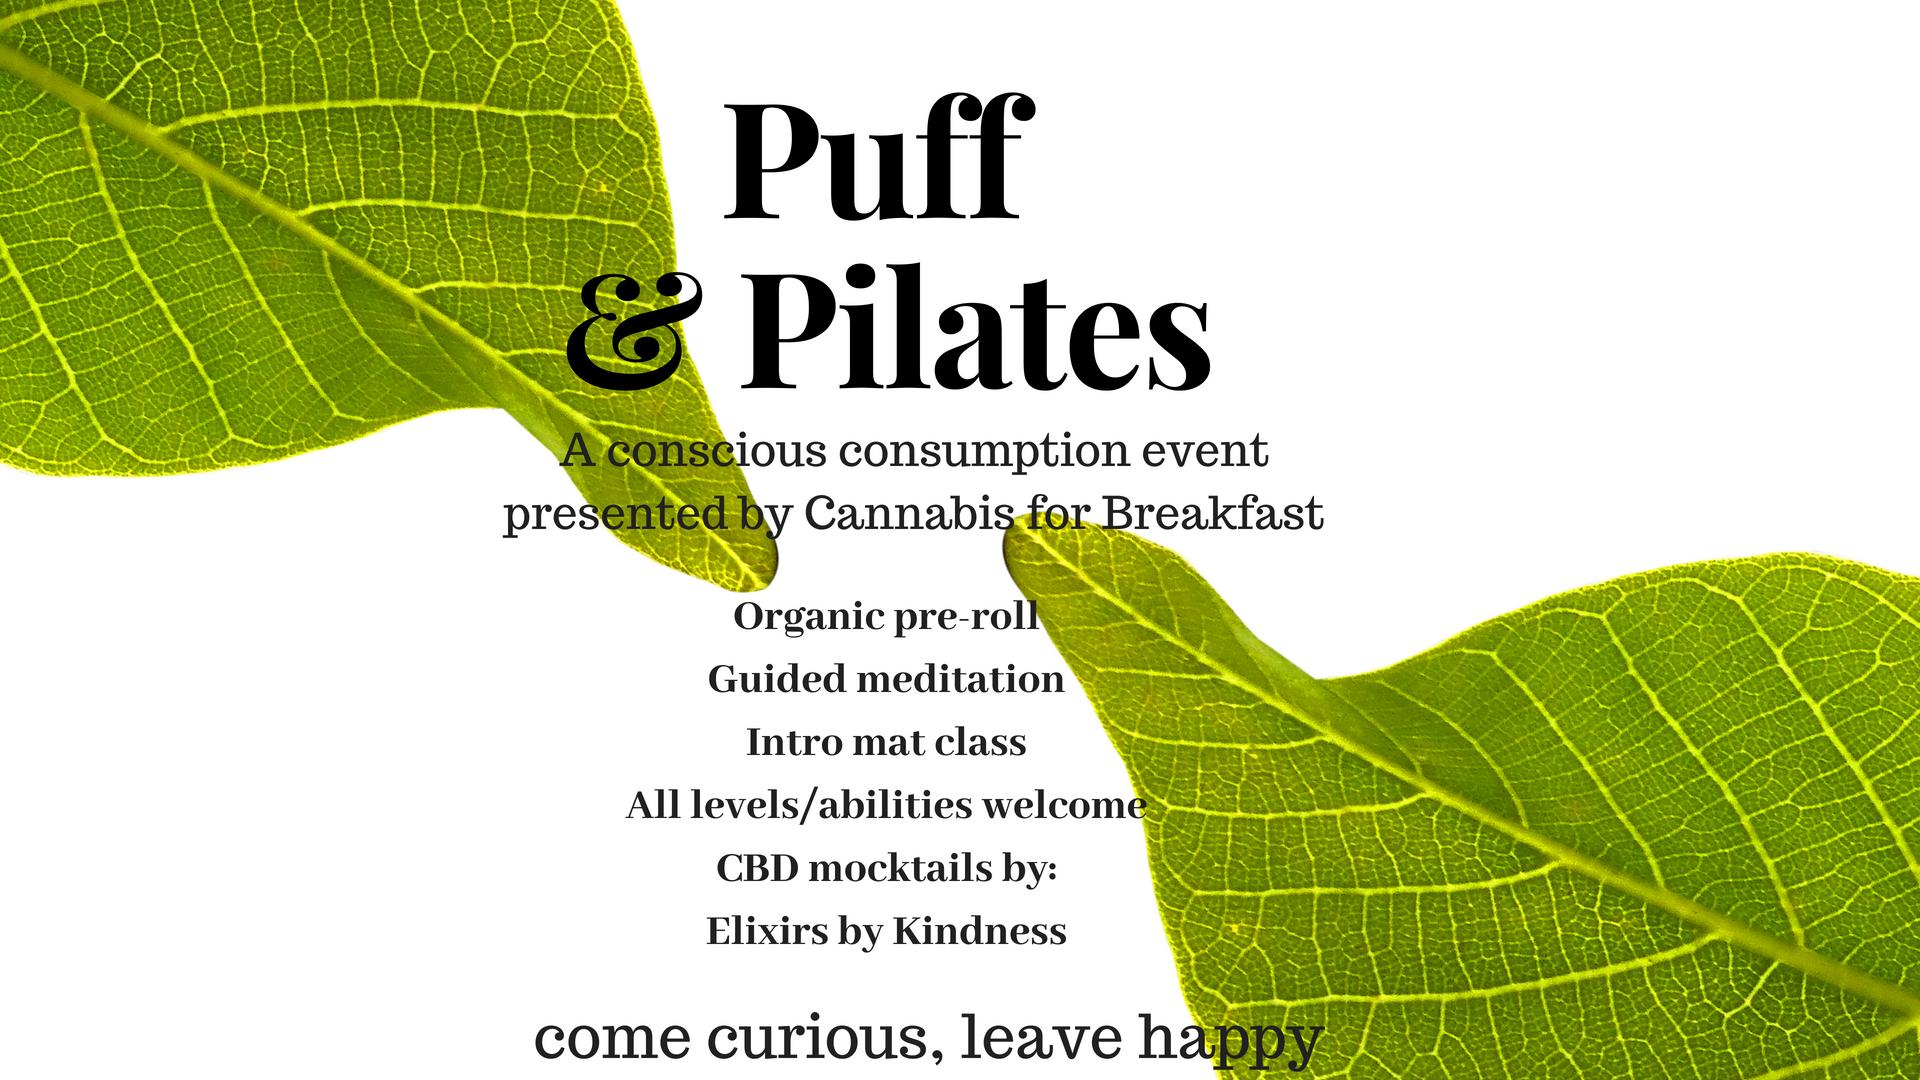 Puff & Pilates